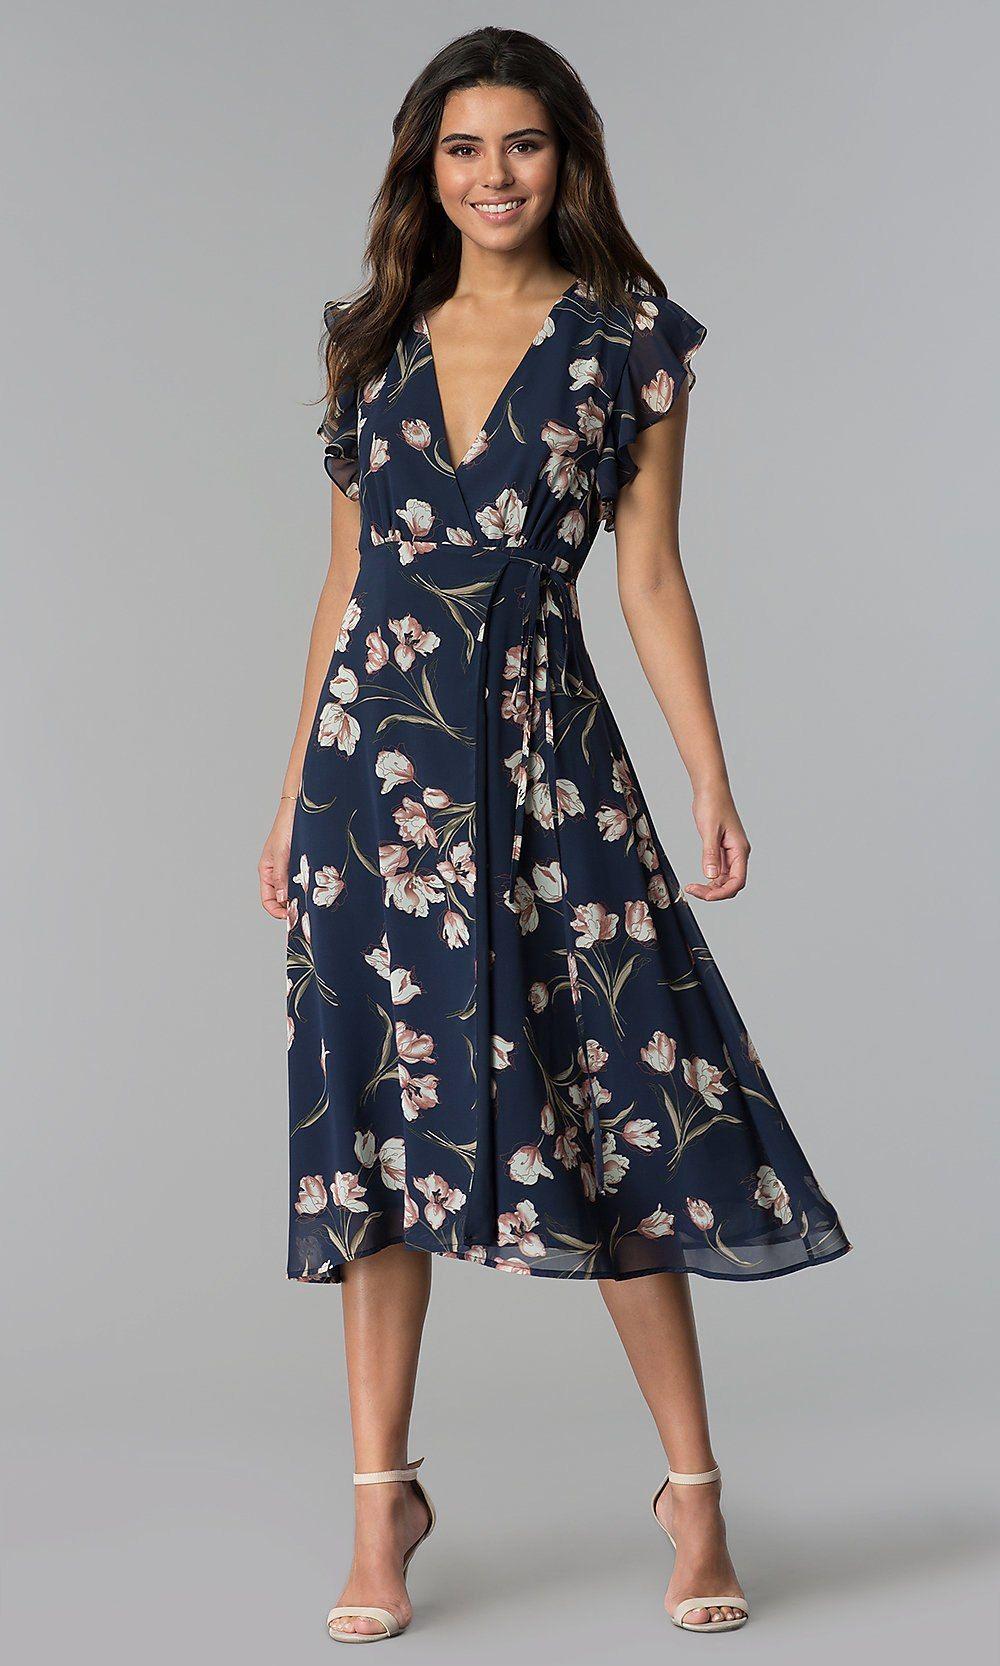 Navy Floral Print Wedding Guest Knee Length Dress In 2019 Dress